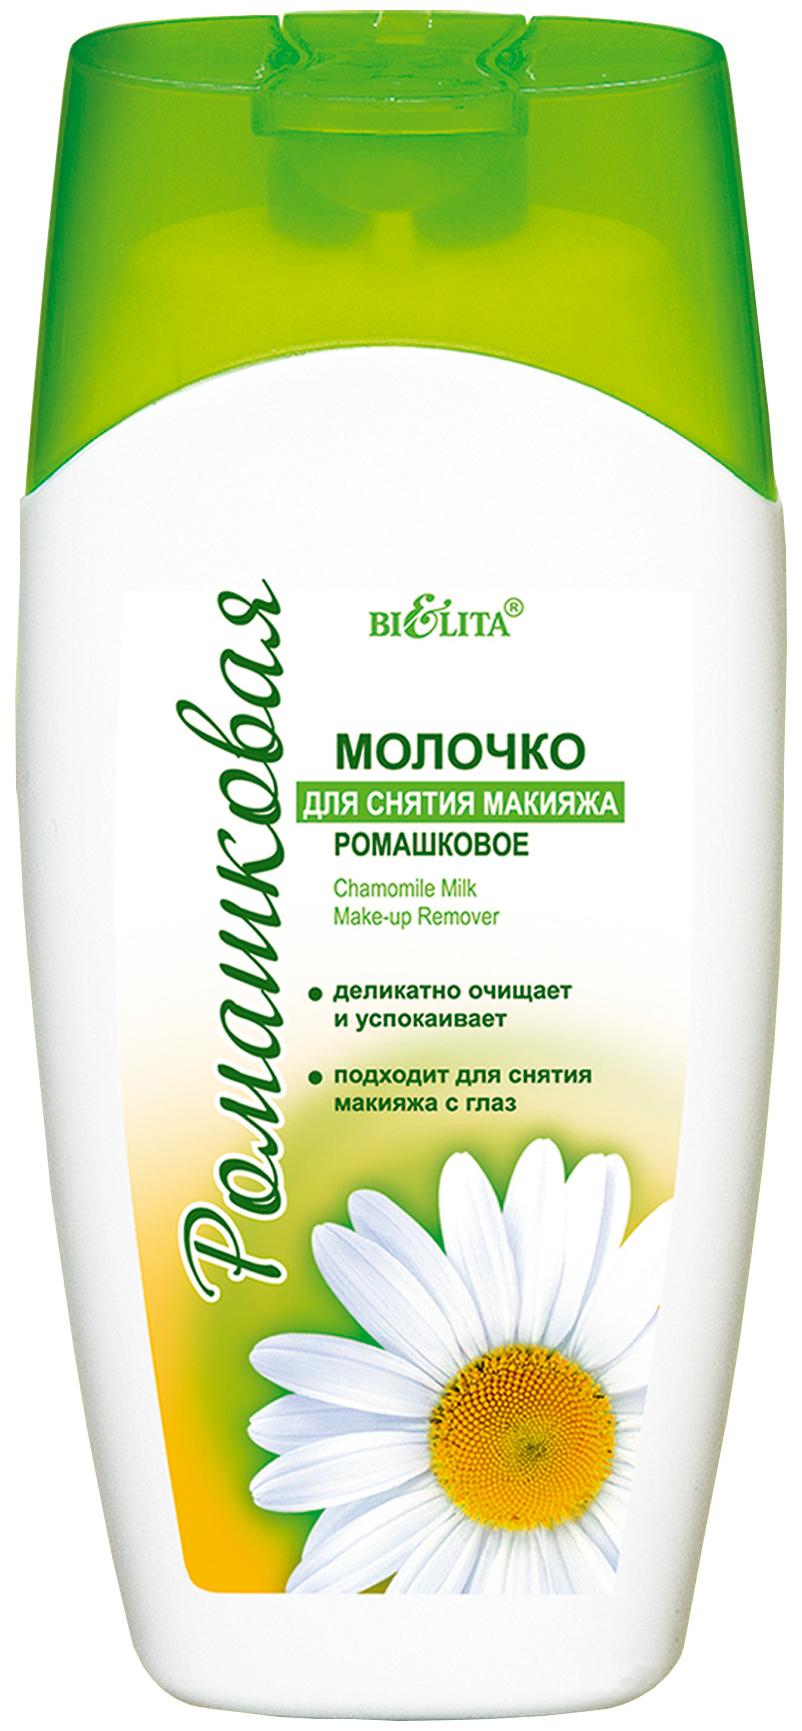 Средство для снятия макияжа Белита Ромашковая Молочко